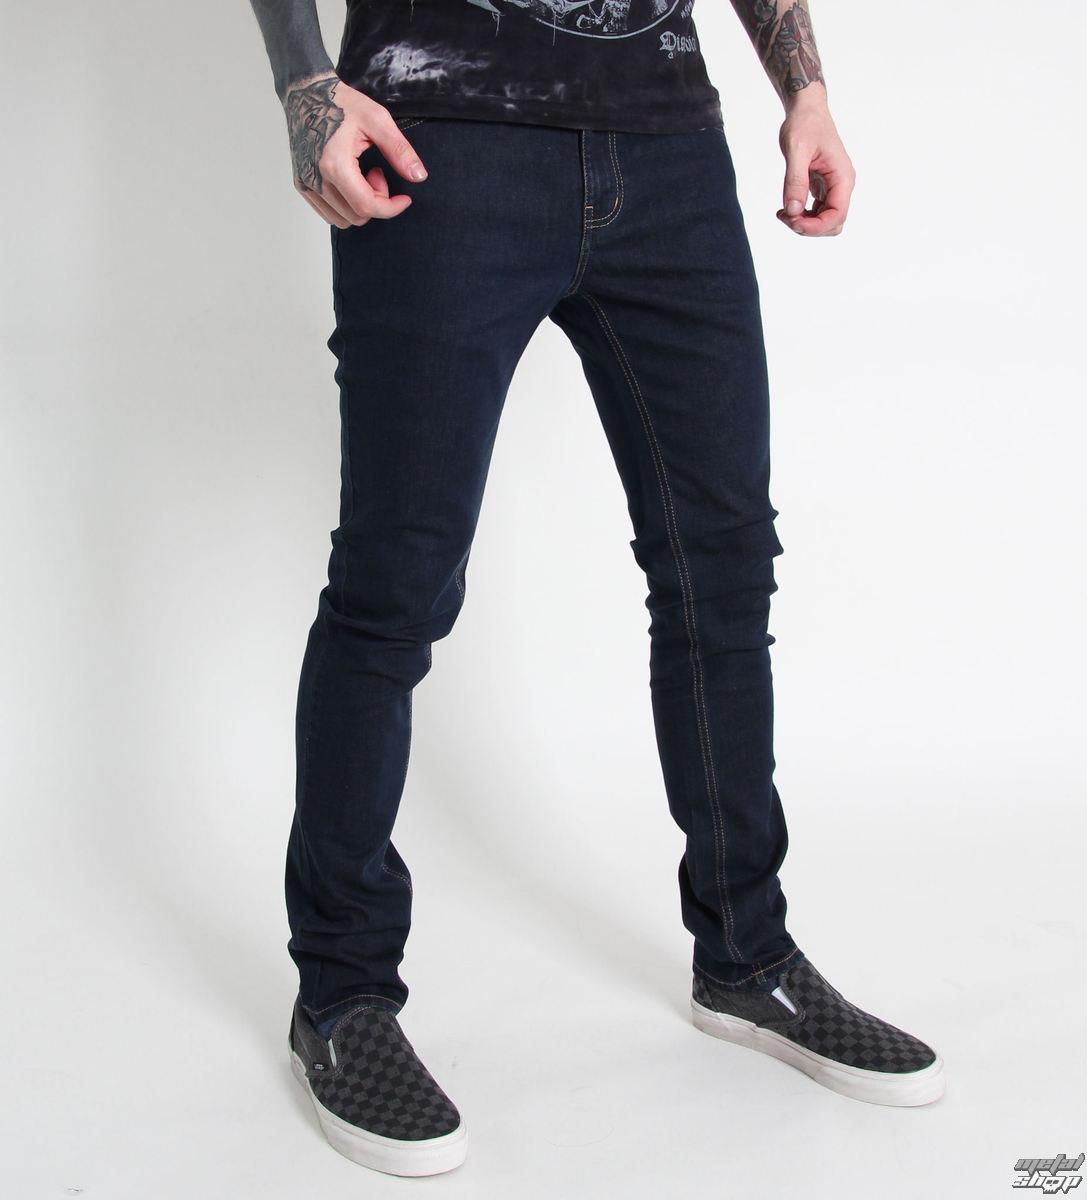 kalhoty pánské FUNSTORM - DECADE Jeans - 91 Dark Indigo